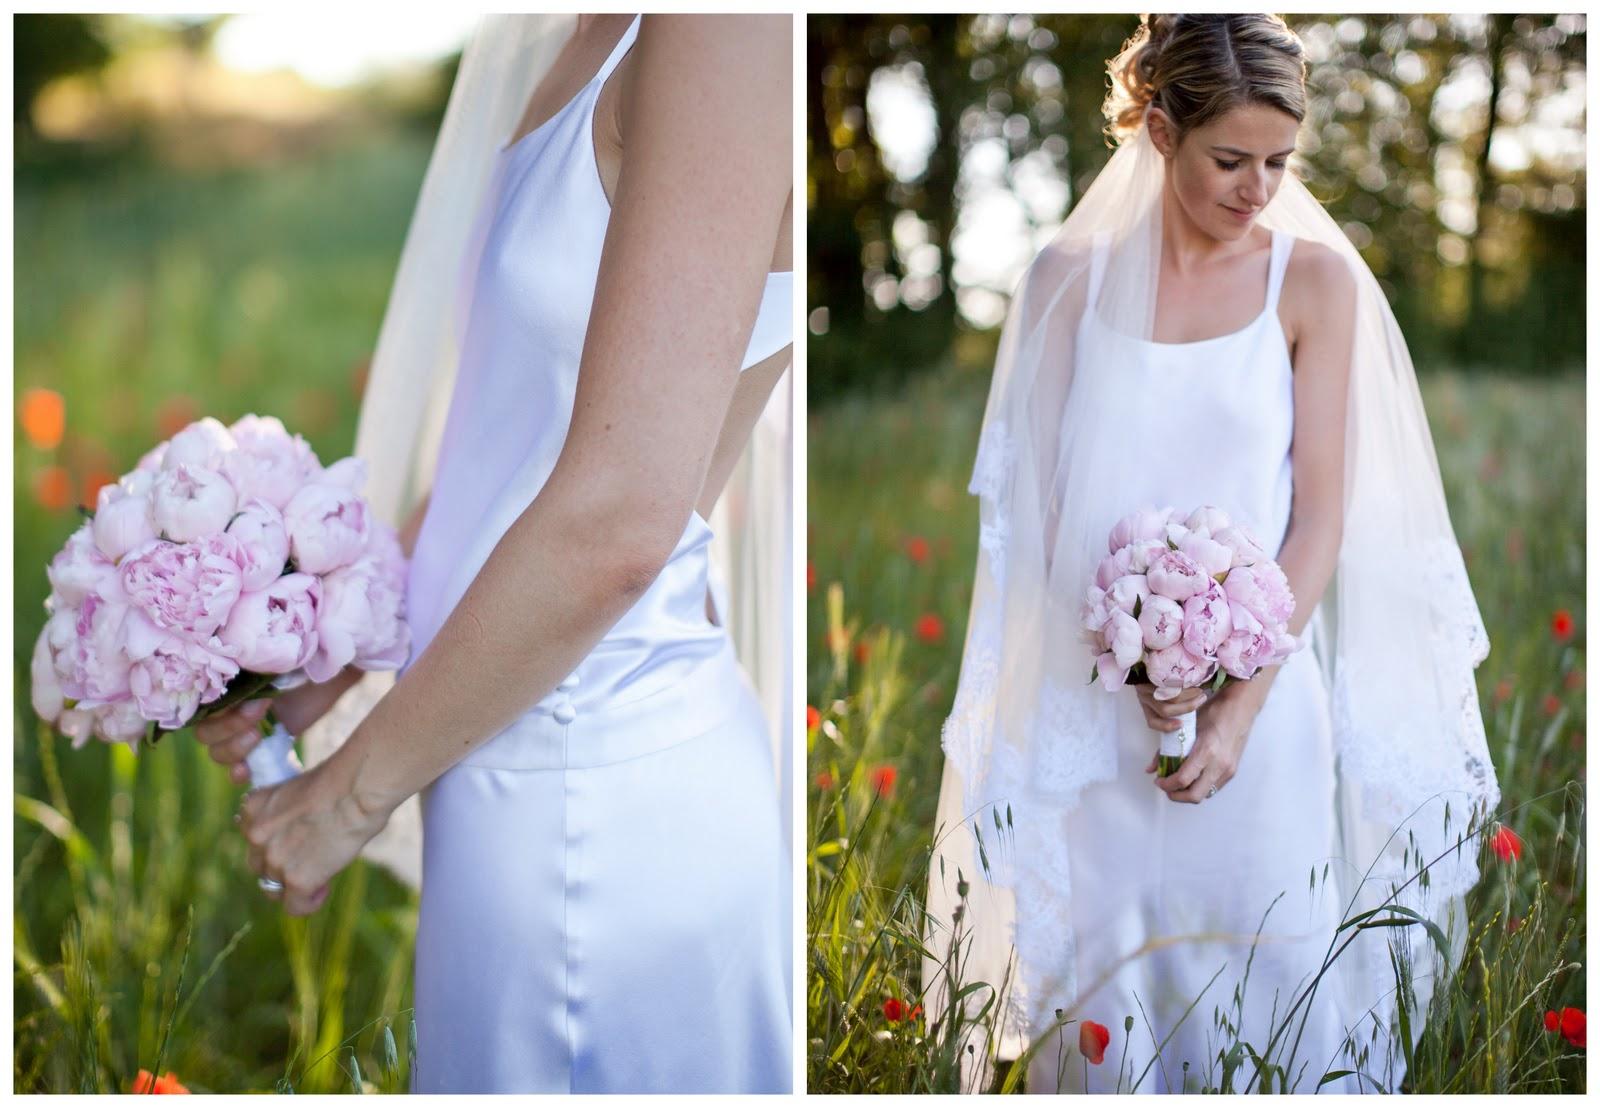 Hillbilly Wedding Dress 51 Fabulous Friday May